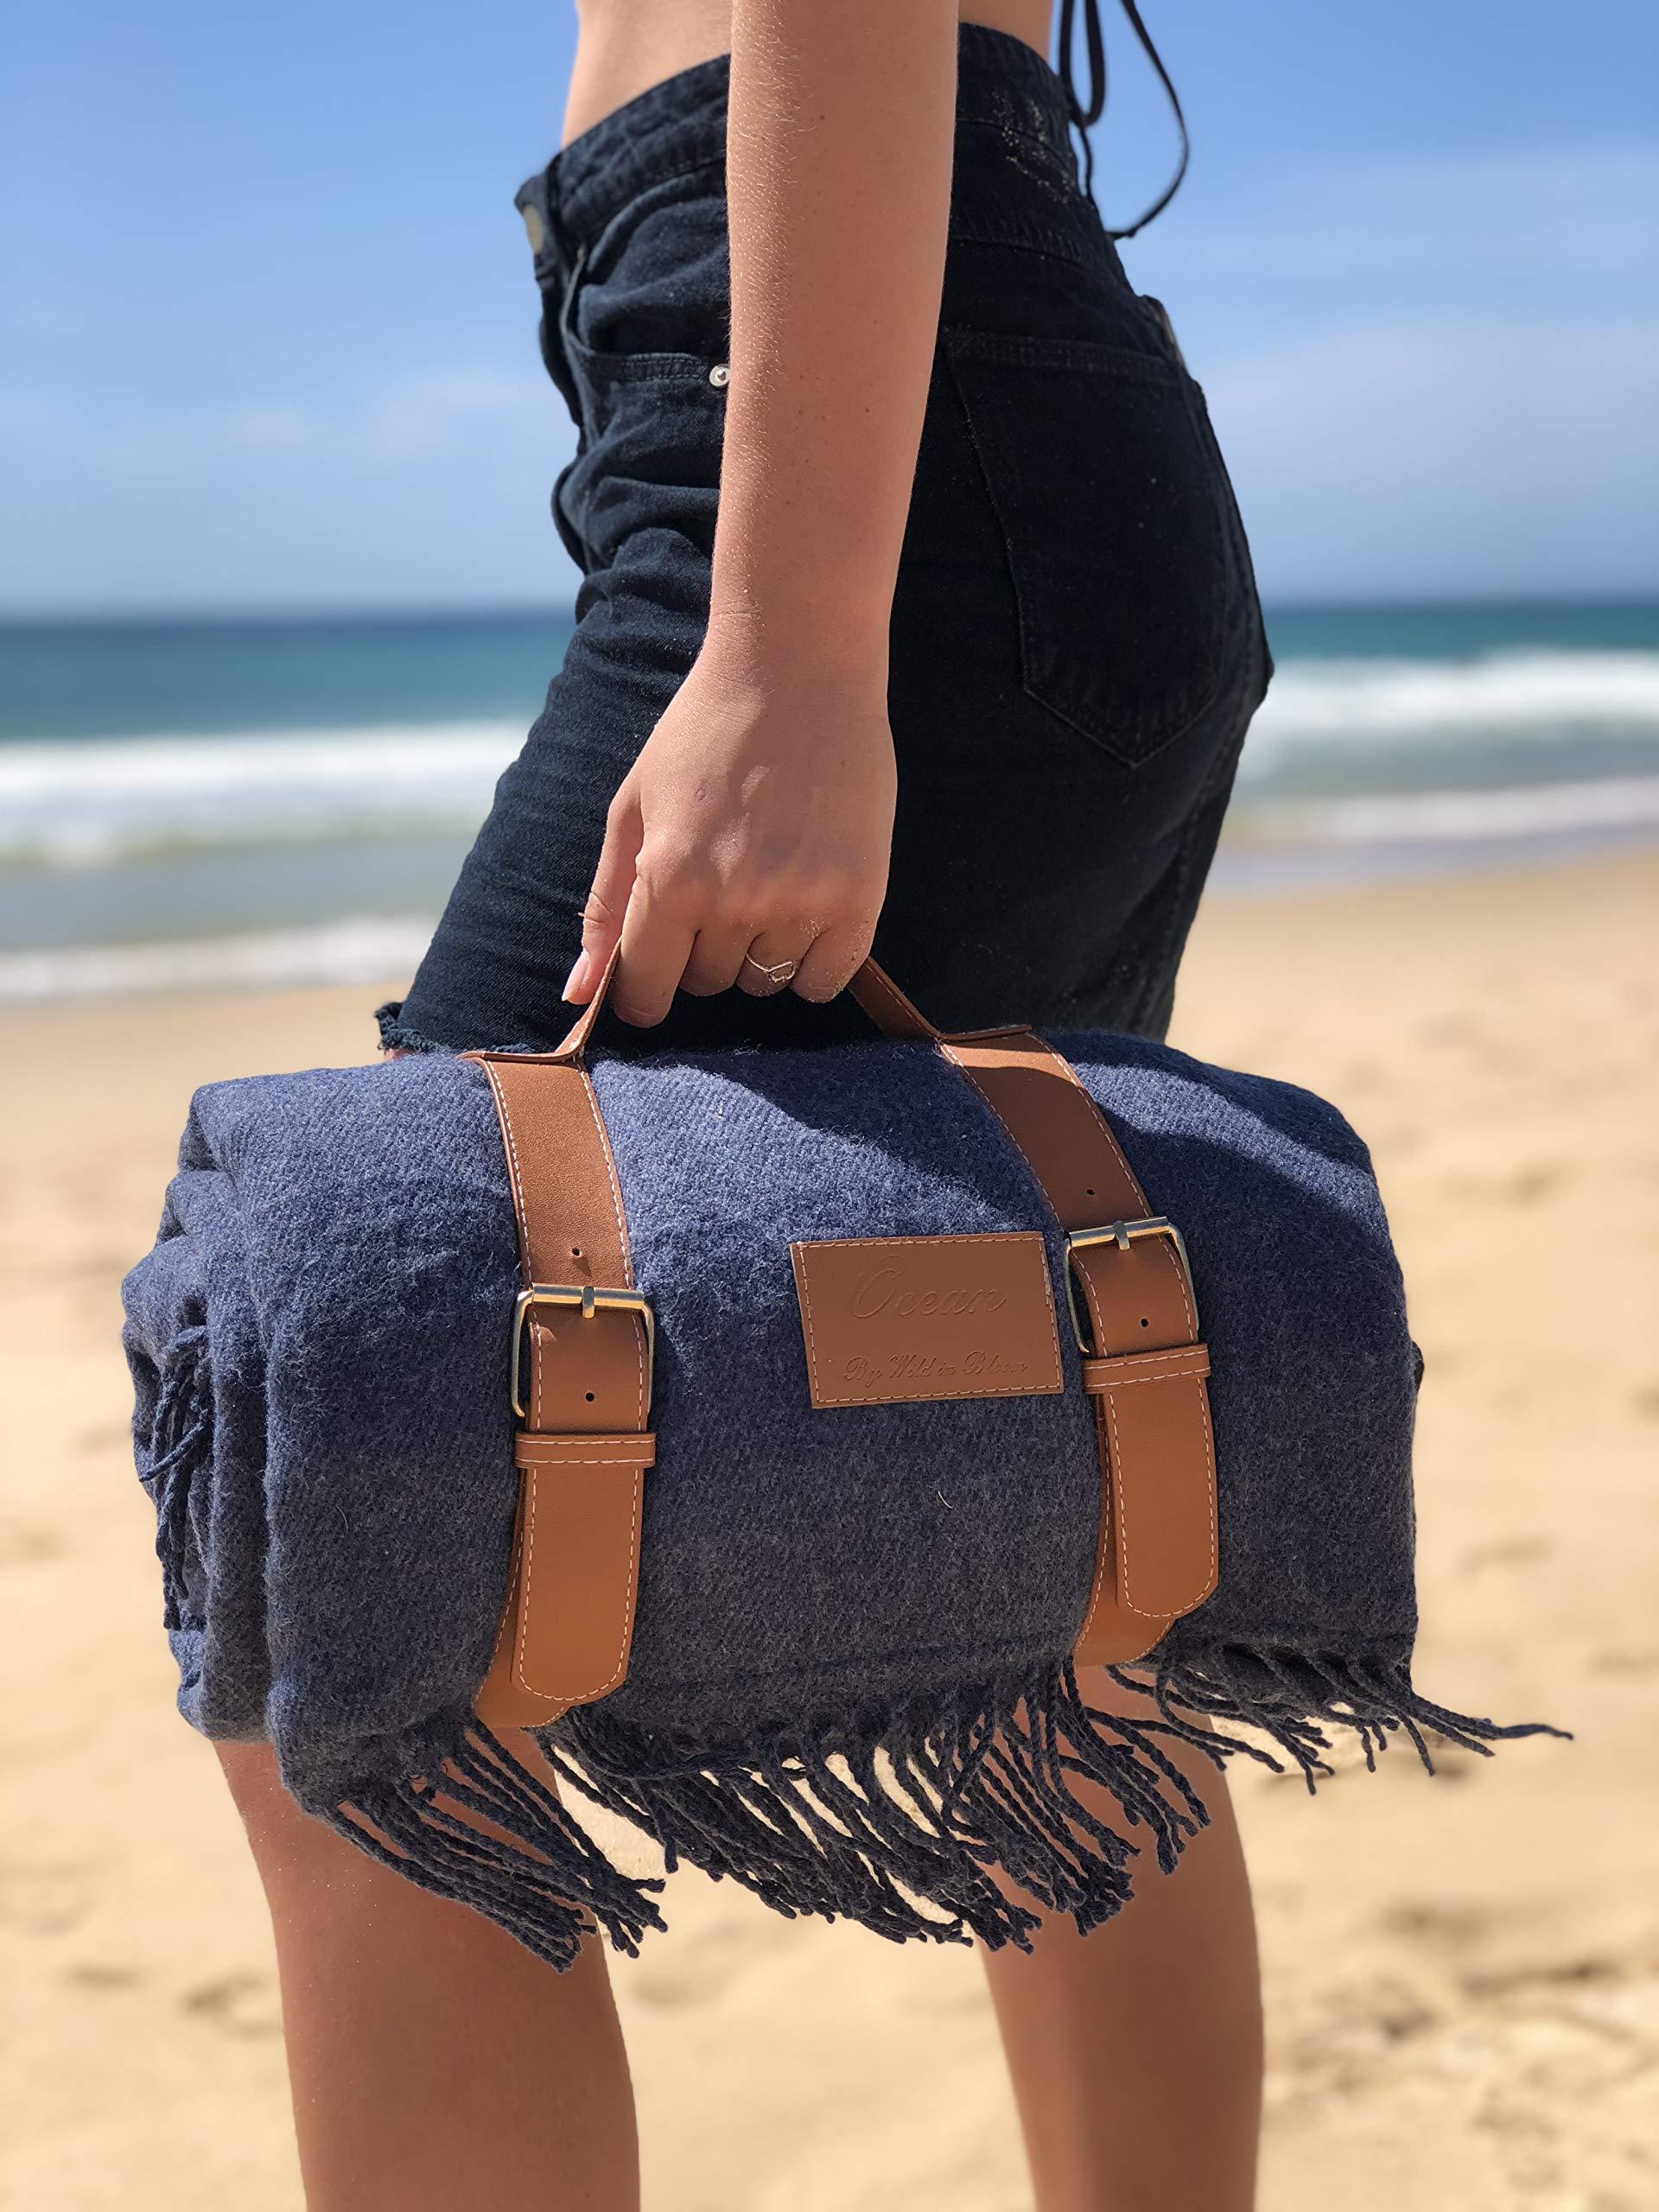 Wild in Bloom, Beach Blanket, Oversized Beach Blanket, Picnic Blanket, Extra Large Picnic Mat, Waterproof, Outdoor Blanket, Gift Box (Blue)